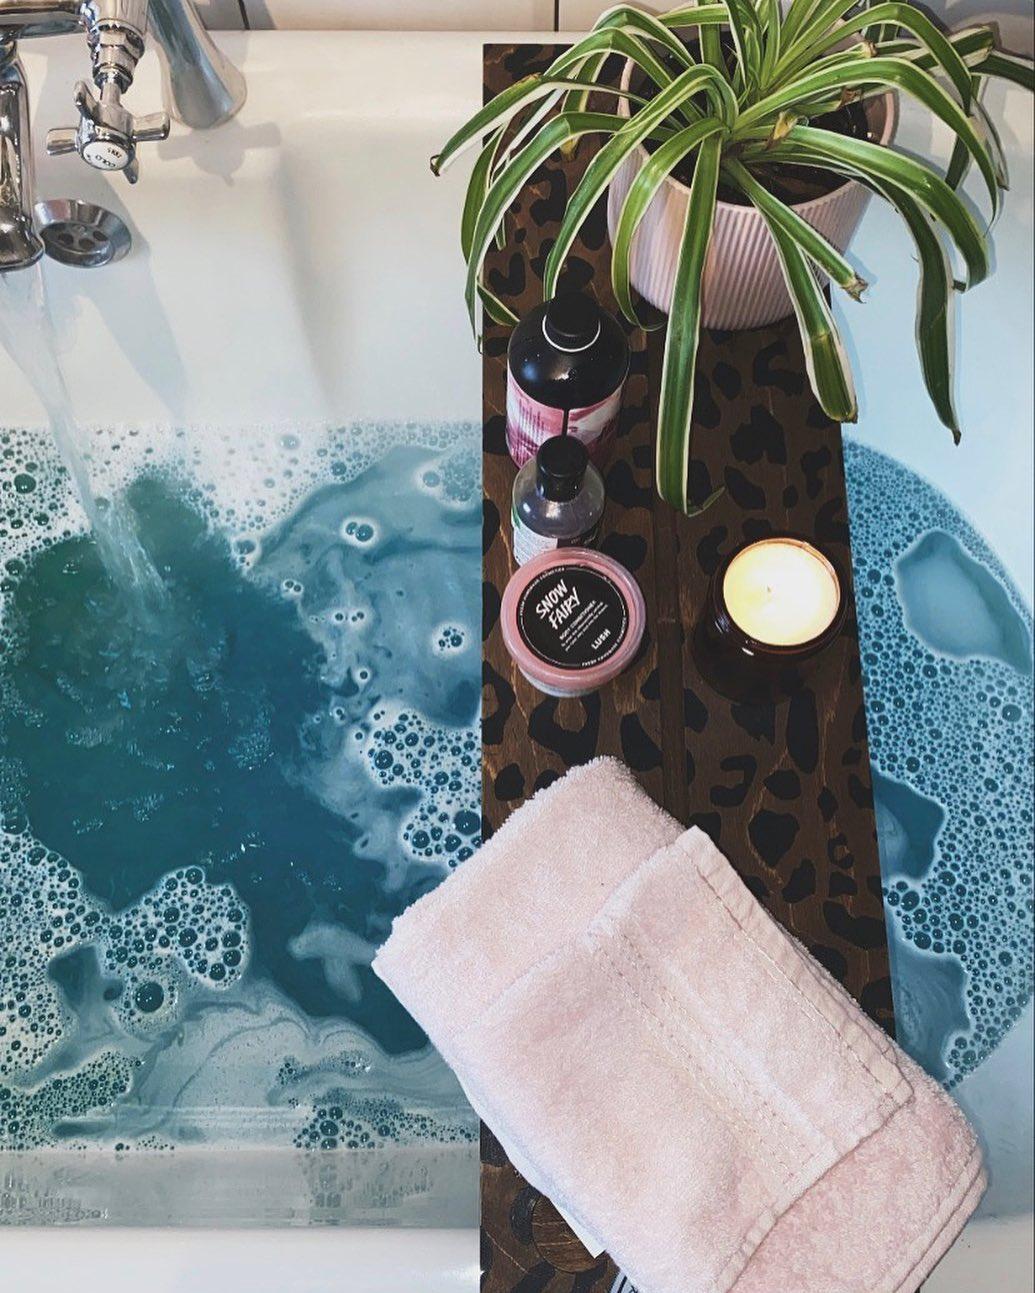 fascinating modern bathroom design ideas   Modern Bathroom Design Ideas - Board and Batten Siding Blog